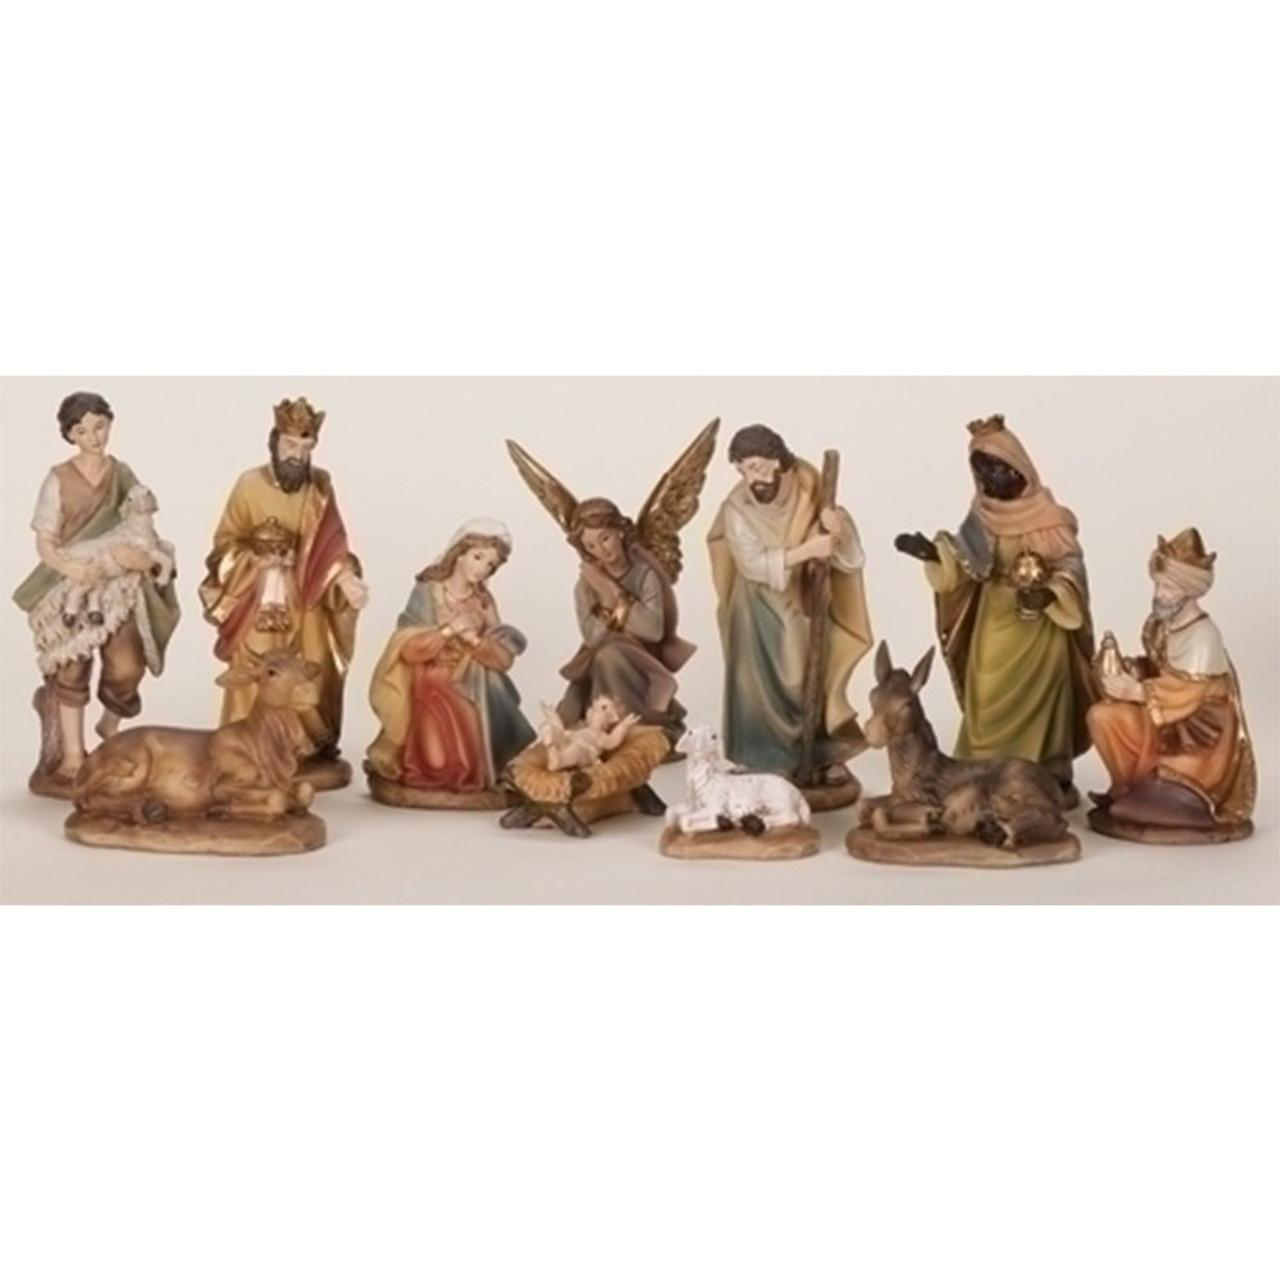 Nativity Set 11PC 6IN - Color